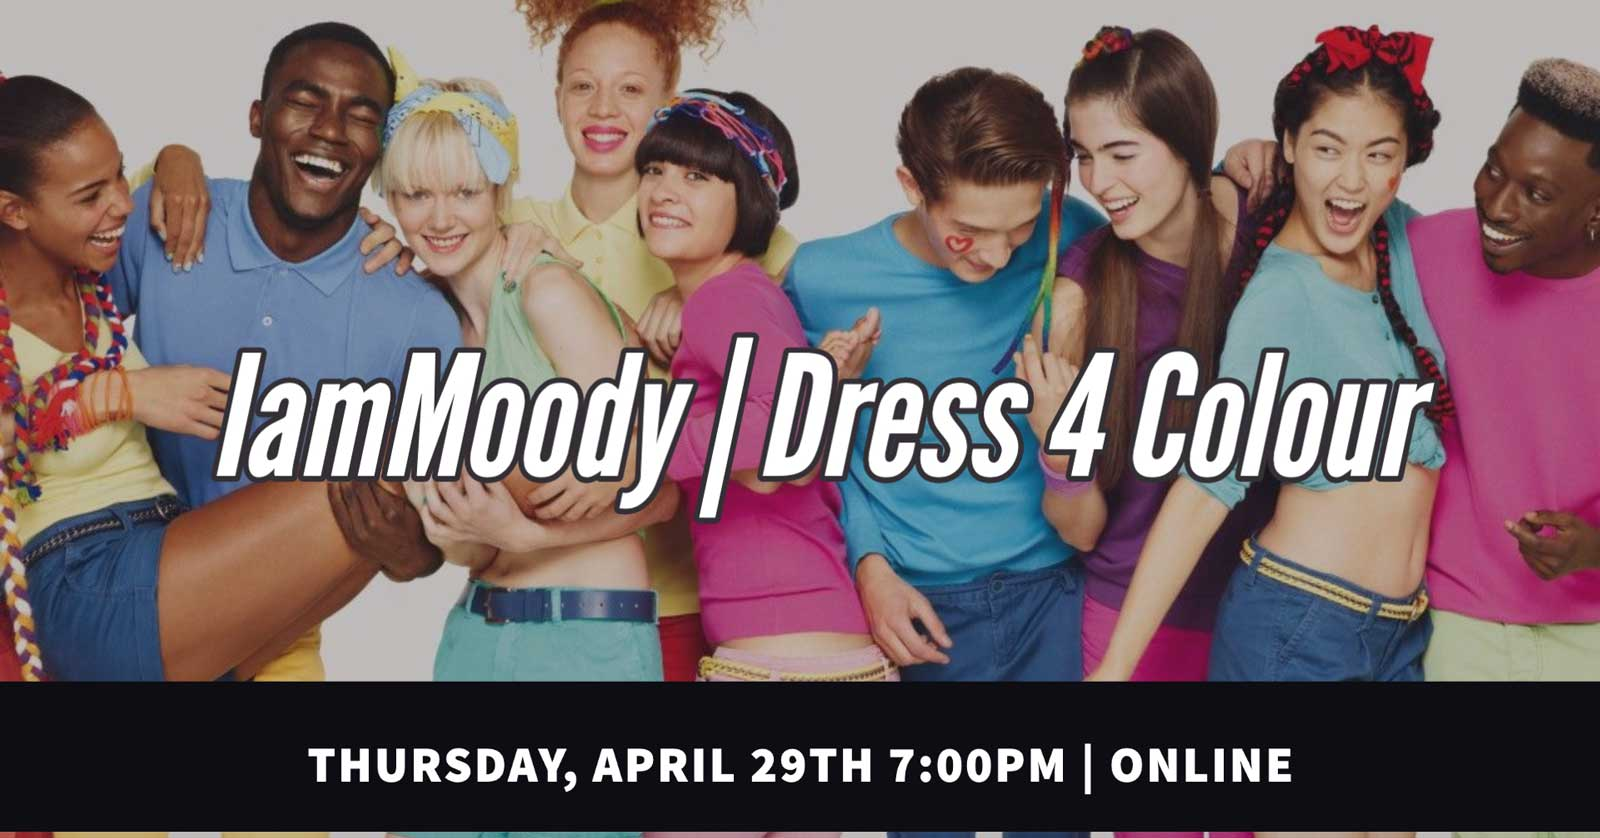 IamMoody Dress 4 Colour 2021